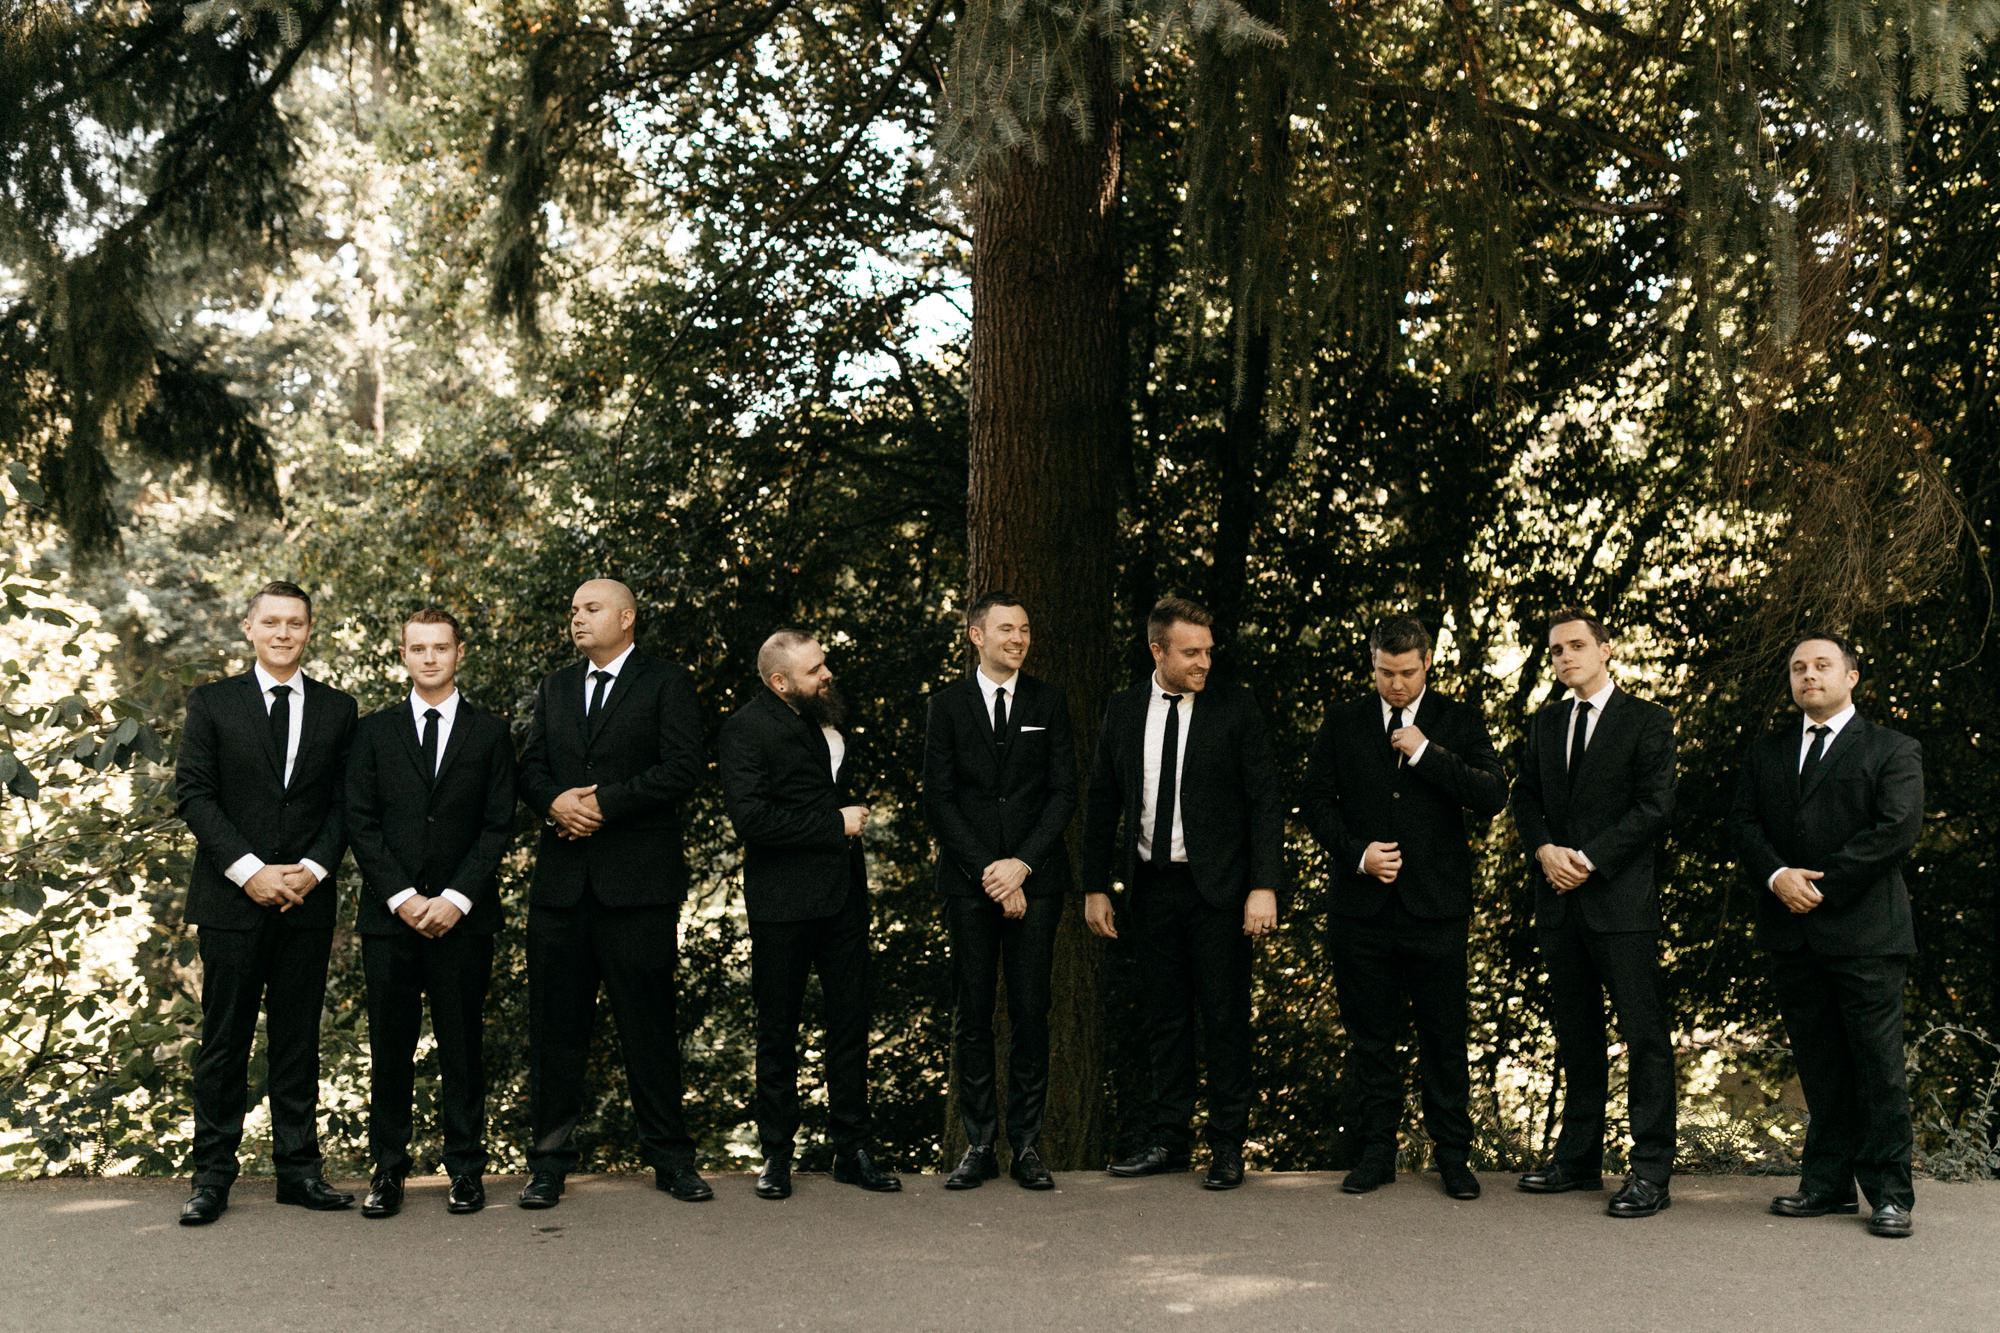 the_evergreen_portland_wedding-31.jpg